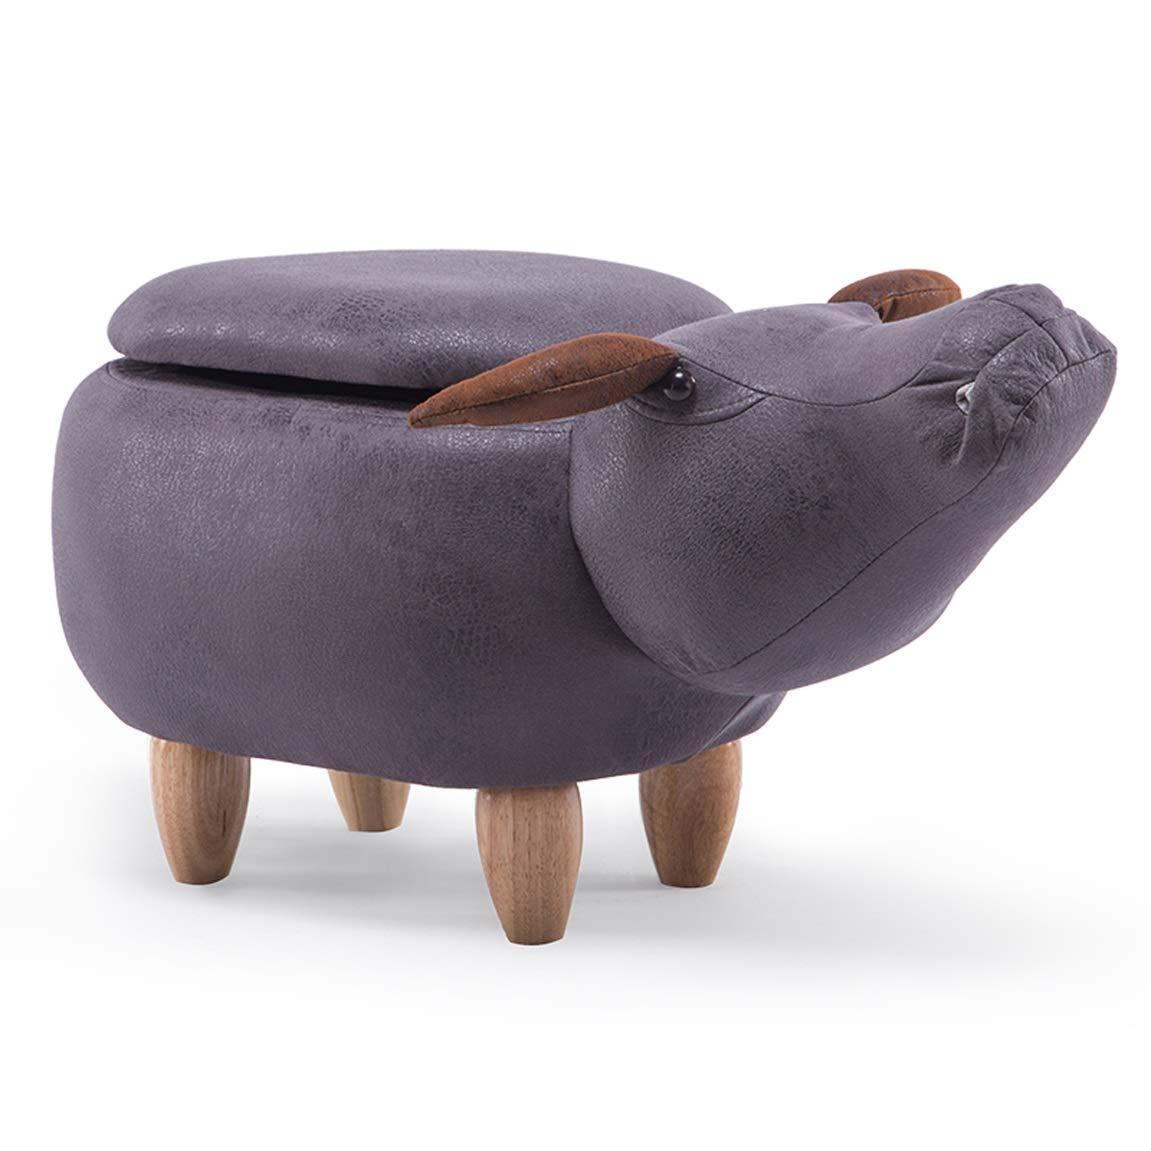 D Storage GAIXIA-Sofa stool Low Stool Change shoes Bench Sofa Stool Cow Piernnel Hall Storage shoes Bench Cartoon Animal Stool Storage Footstool 69x35x37cm (color   D, Size   Storage)